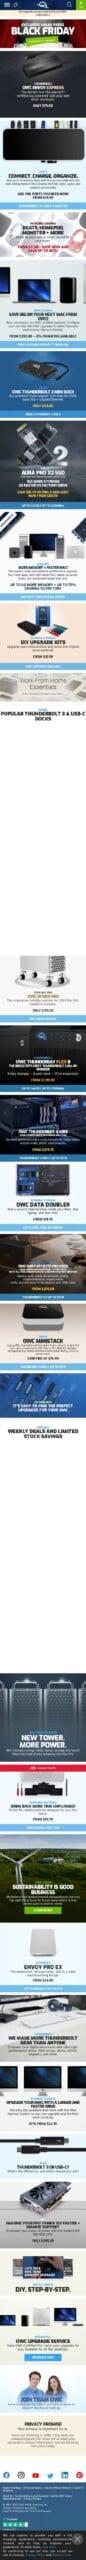 Mac Sales | Other World Computing Coupon